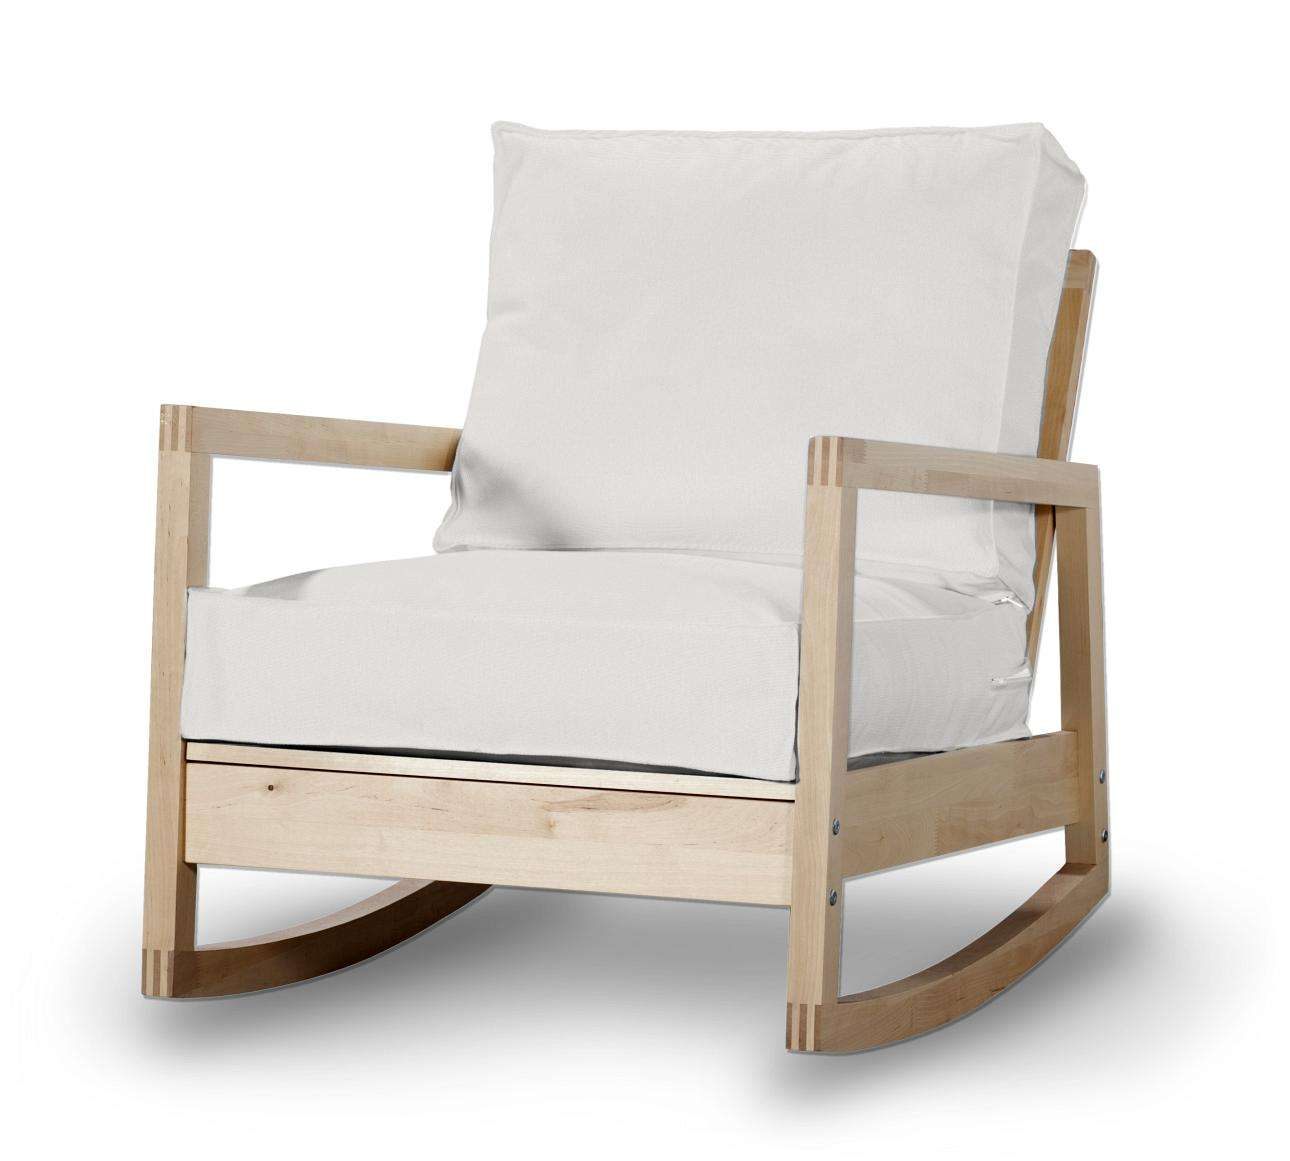 Pokrowiec na fotel Lillberg Fotel Lillberg w kolekcji Etna , tkanina: 705-01